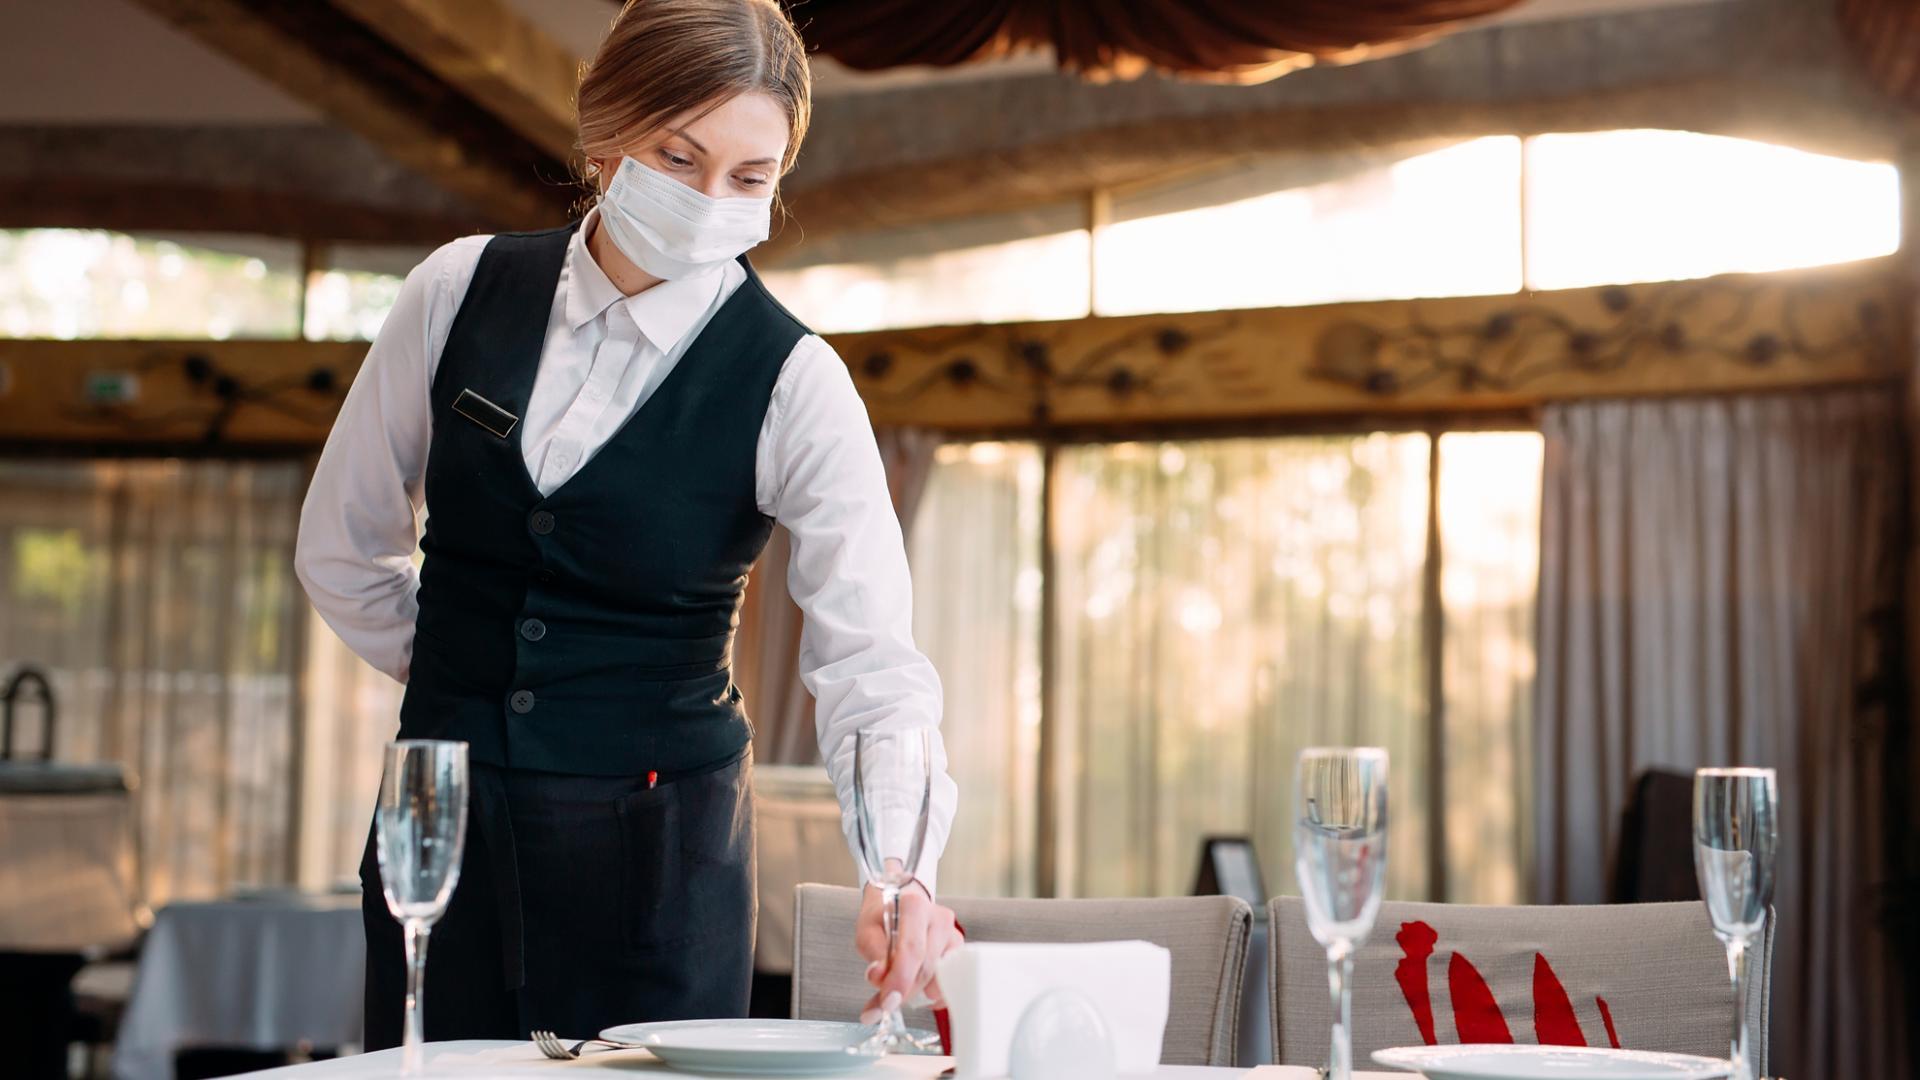 Kellnerin Restaurant Mundschutz